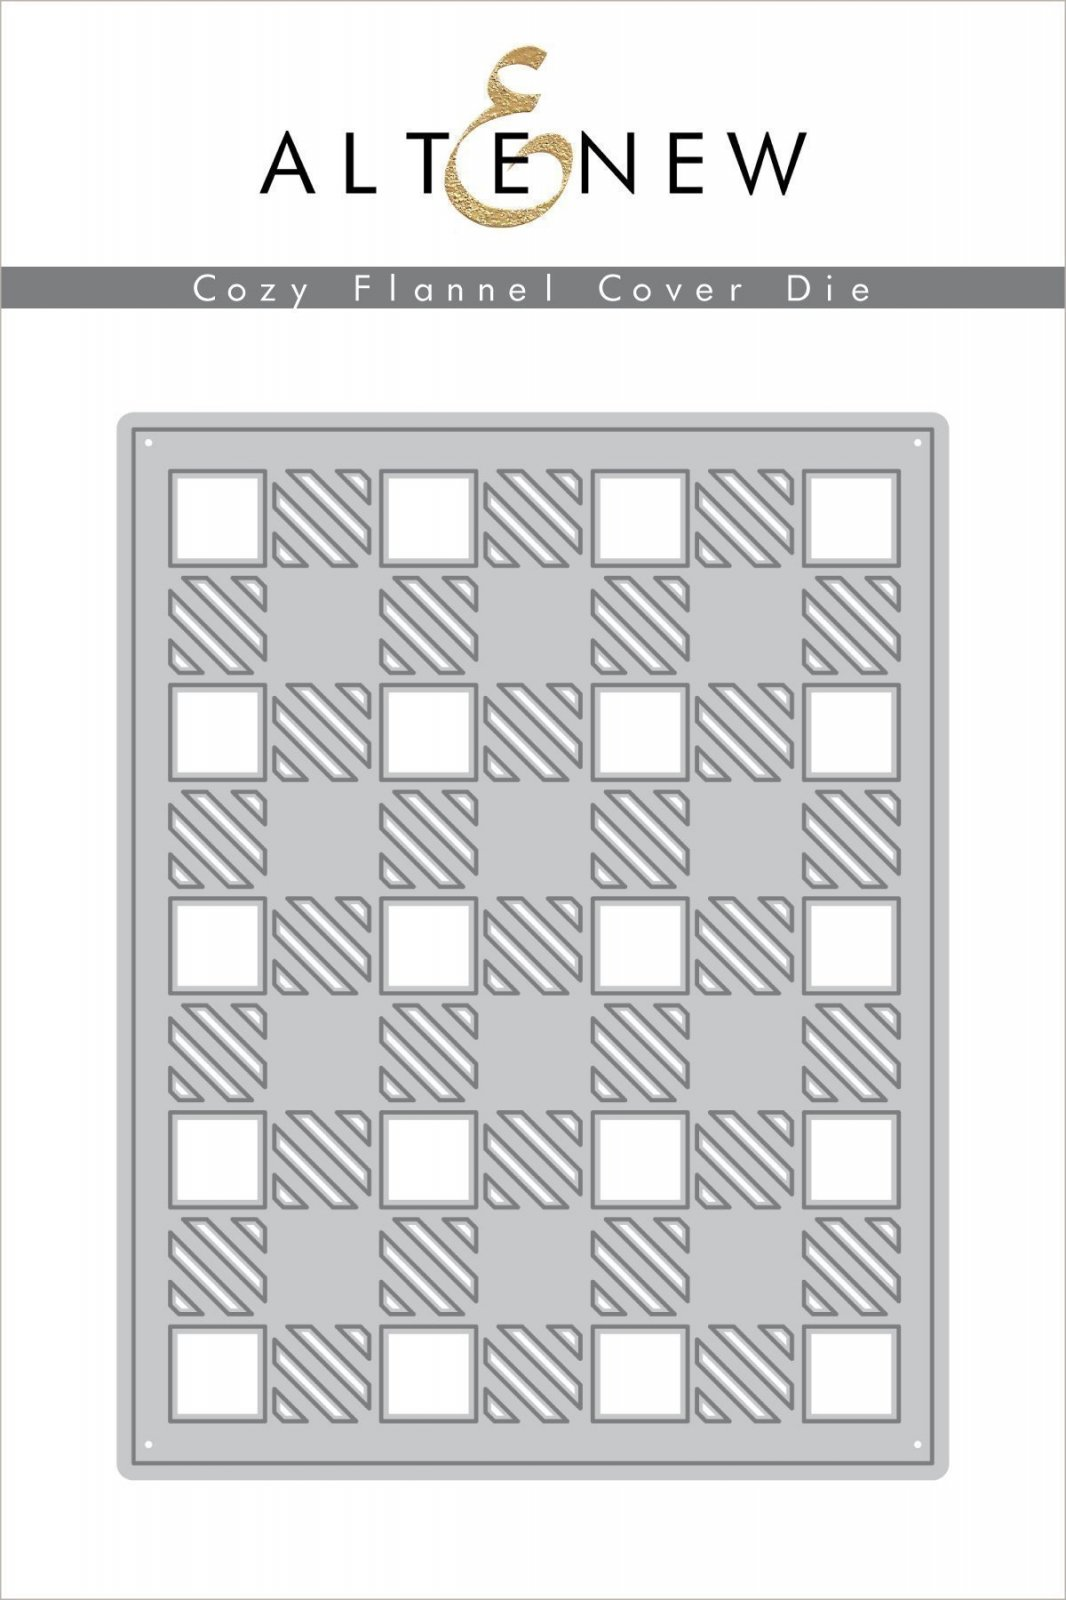 Altenew - Cozy Flannel Cover Die